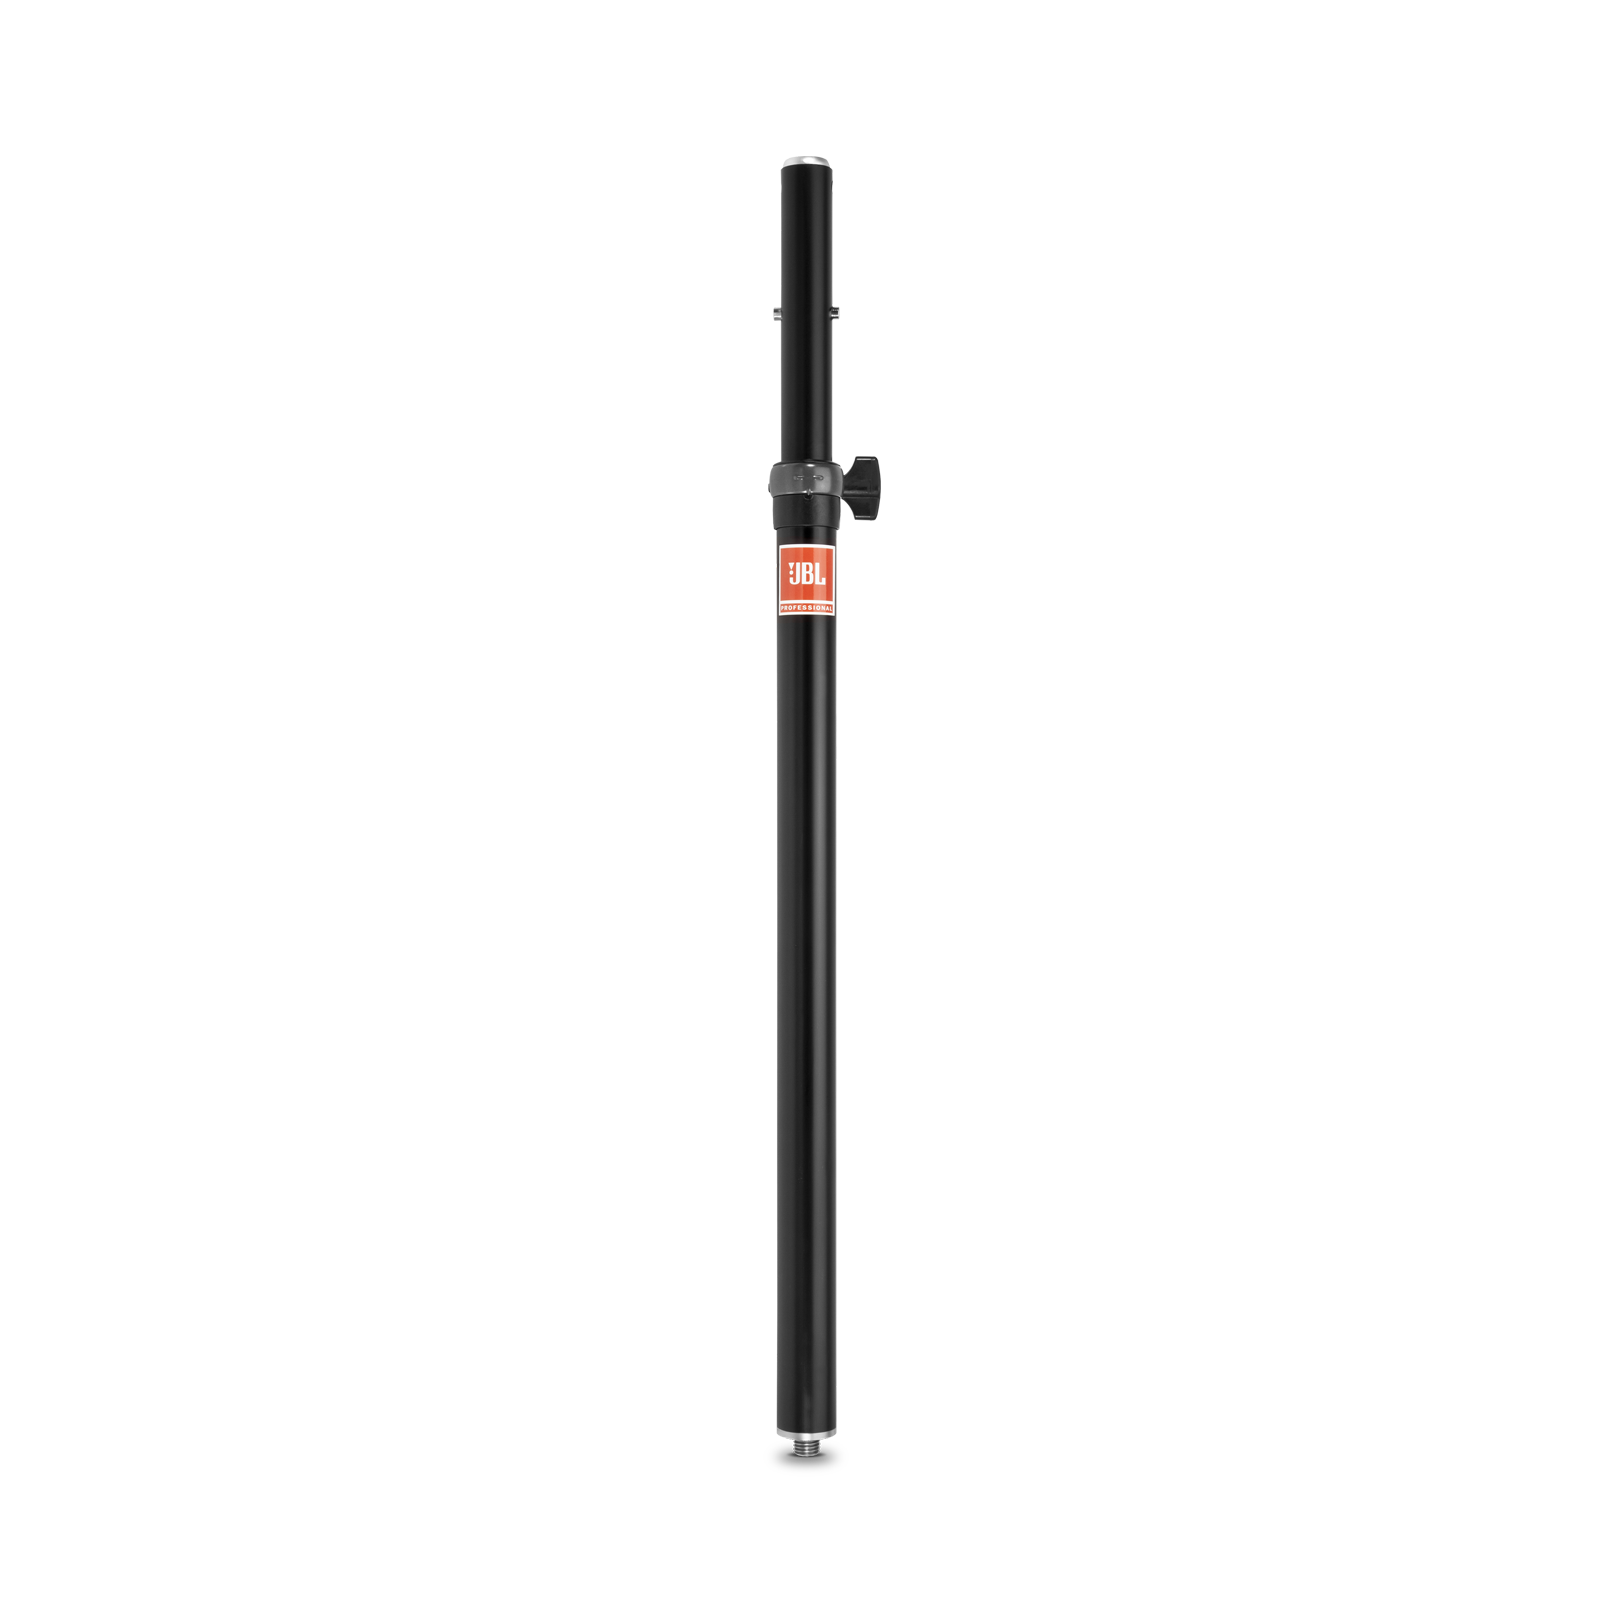 JBL Speaker Pole (Manual Assist)